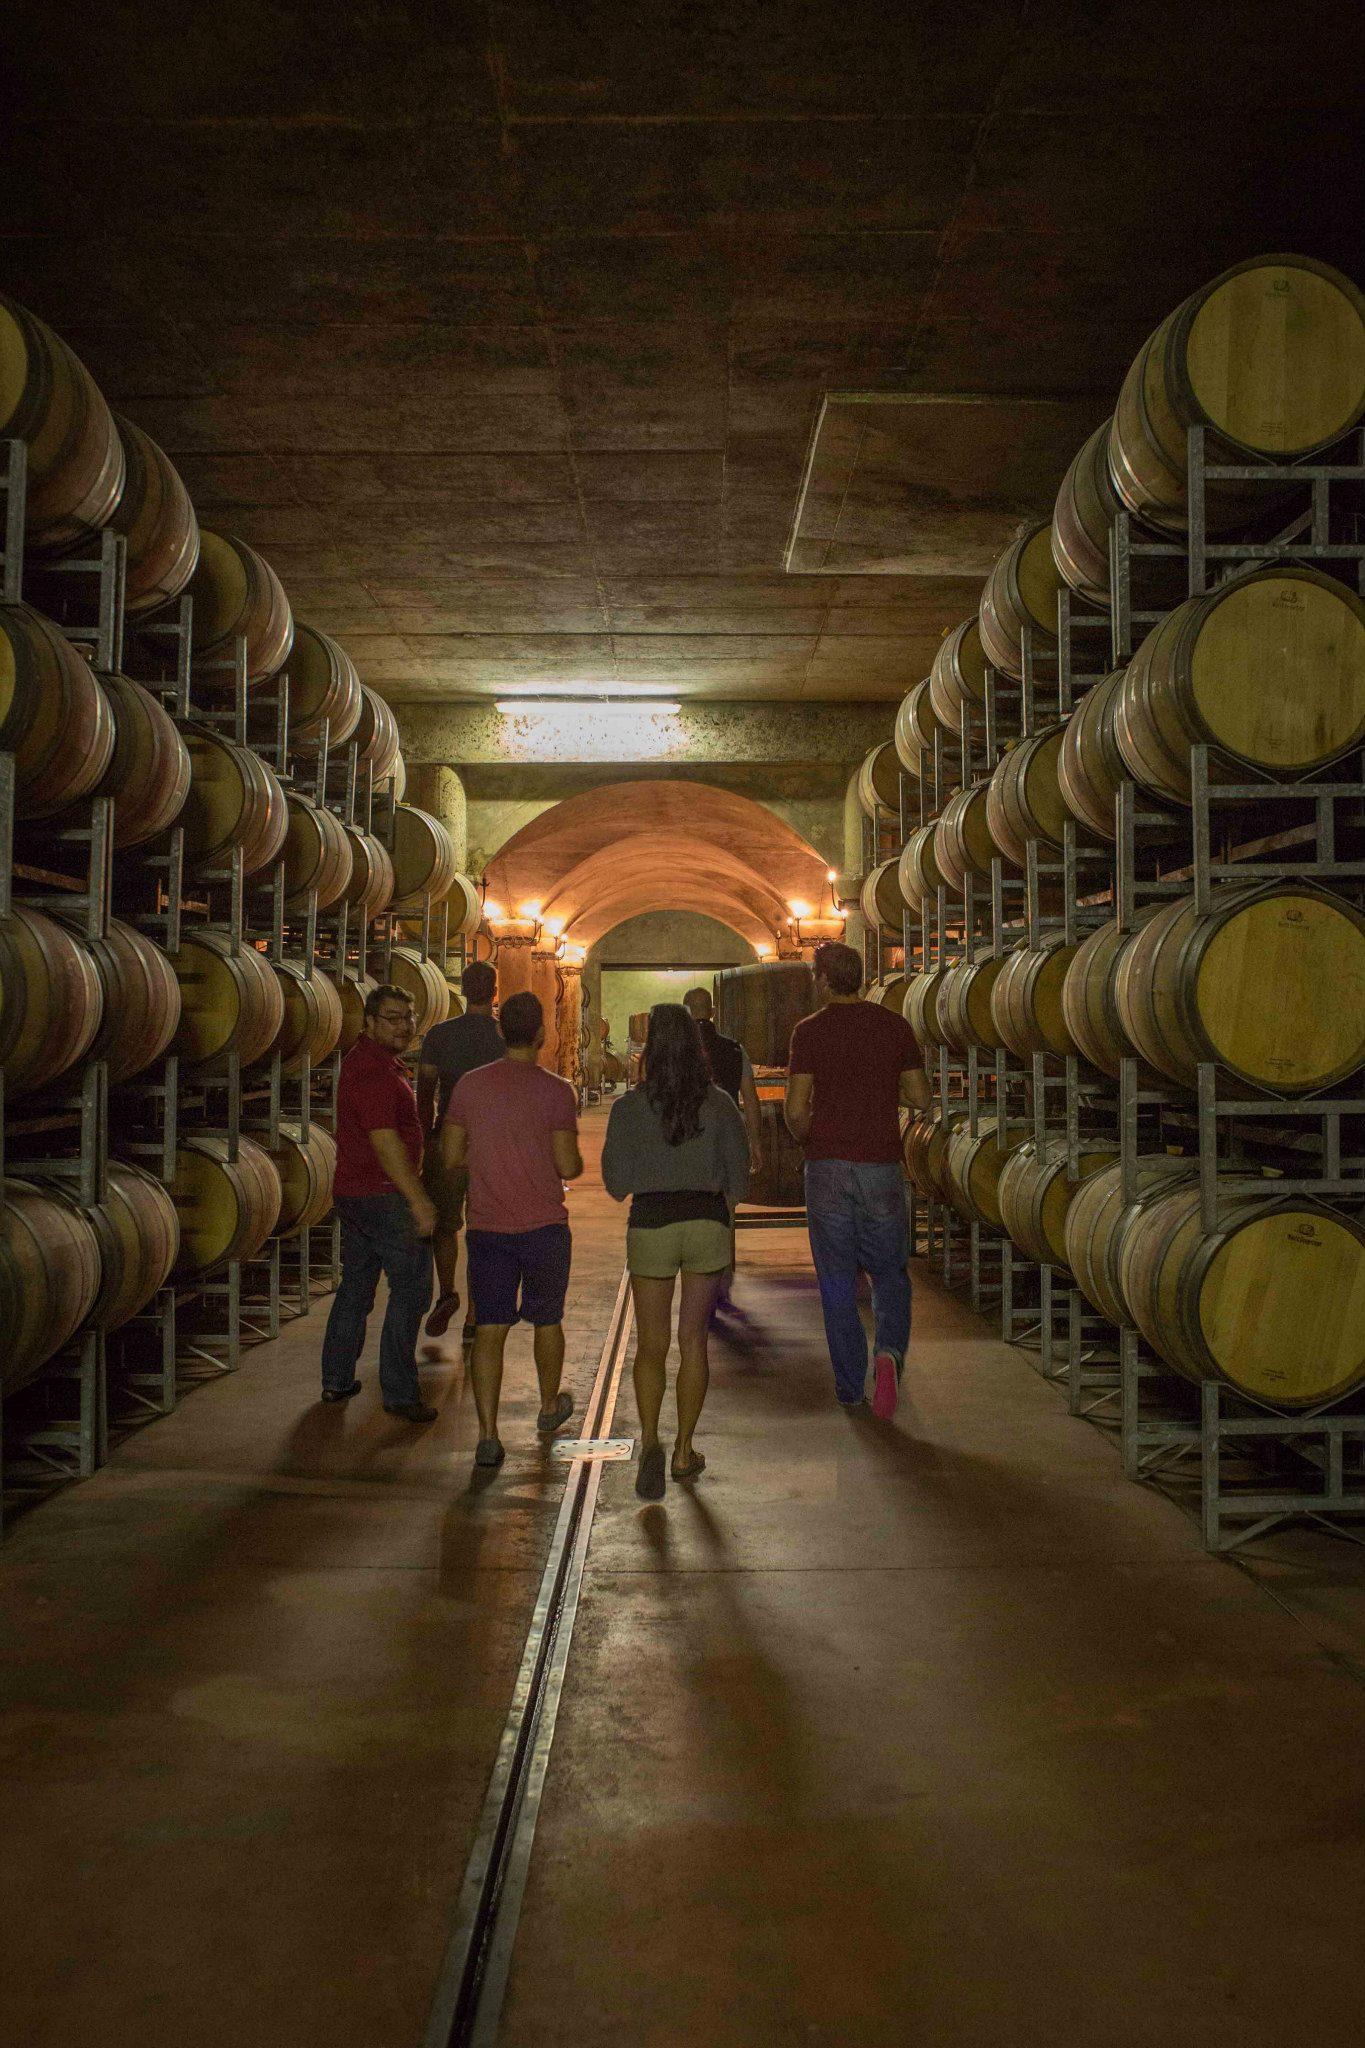 The cellars at Avondale